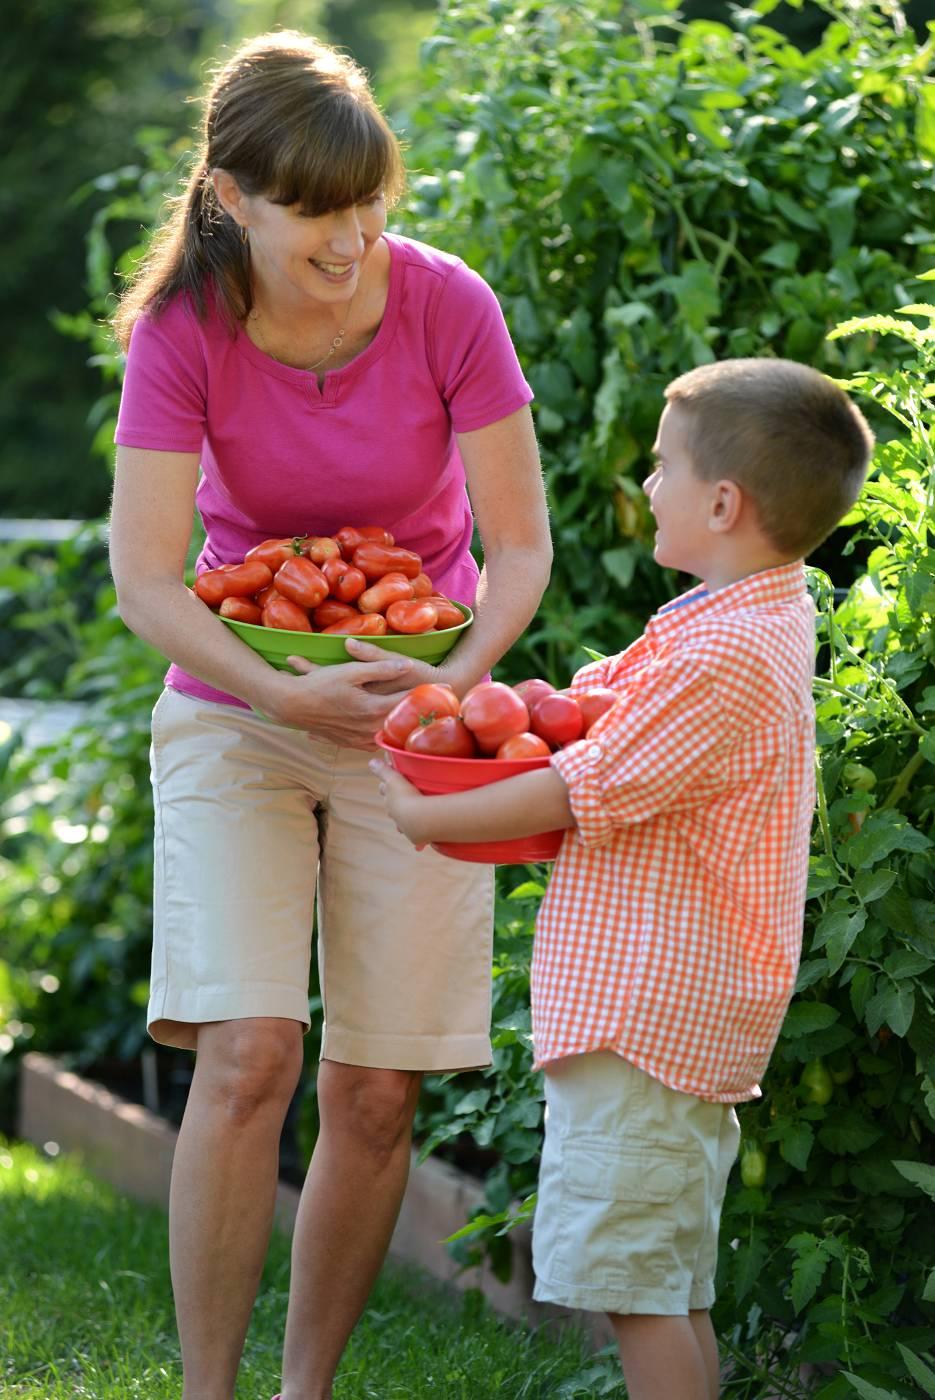 Irving Elementary Imc Help Bring The Burpee Home Gardens